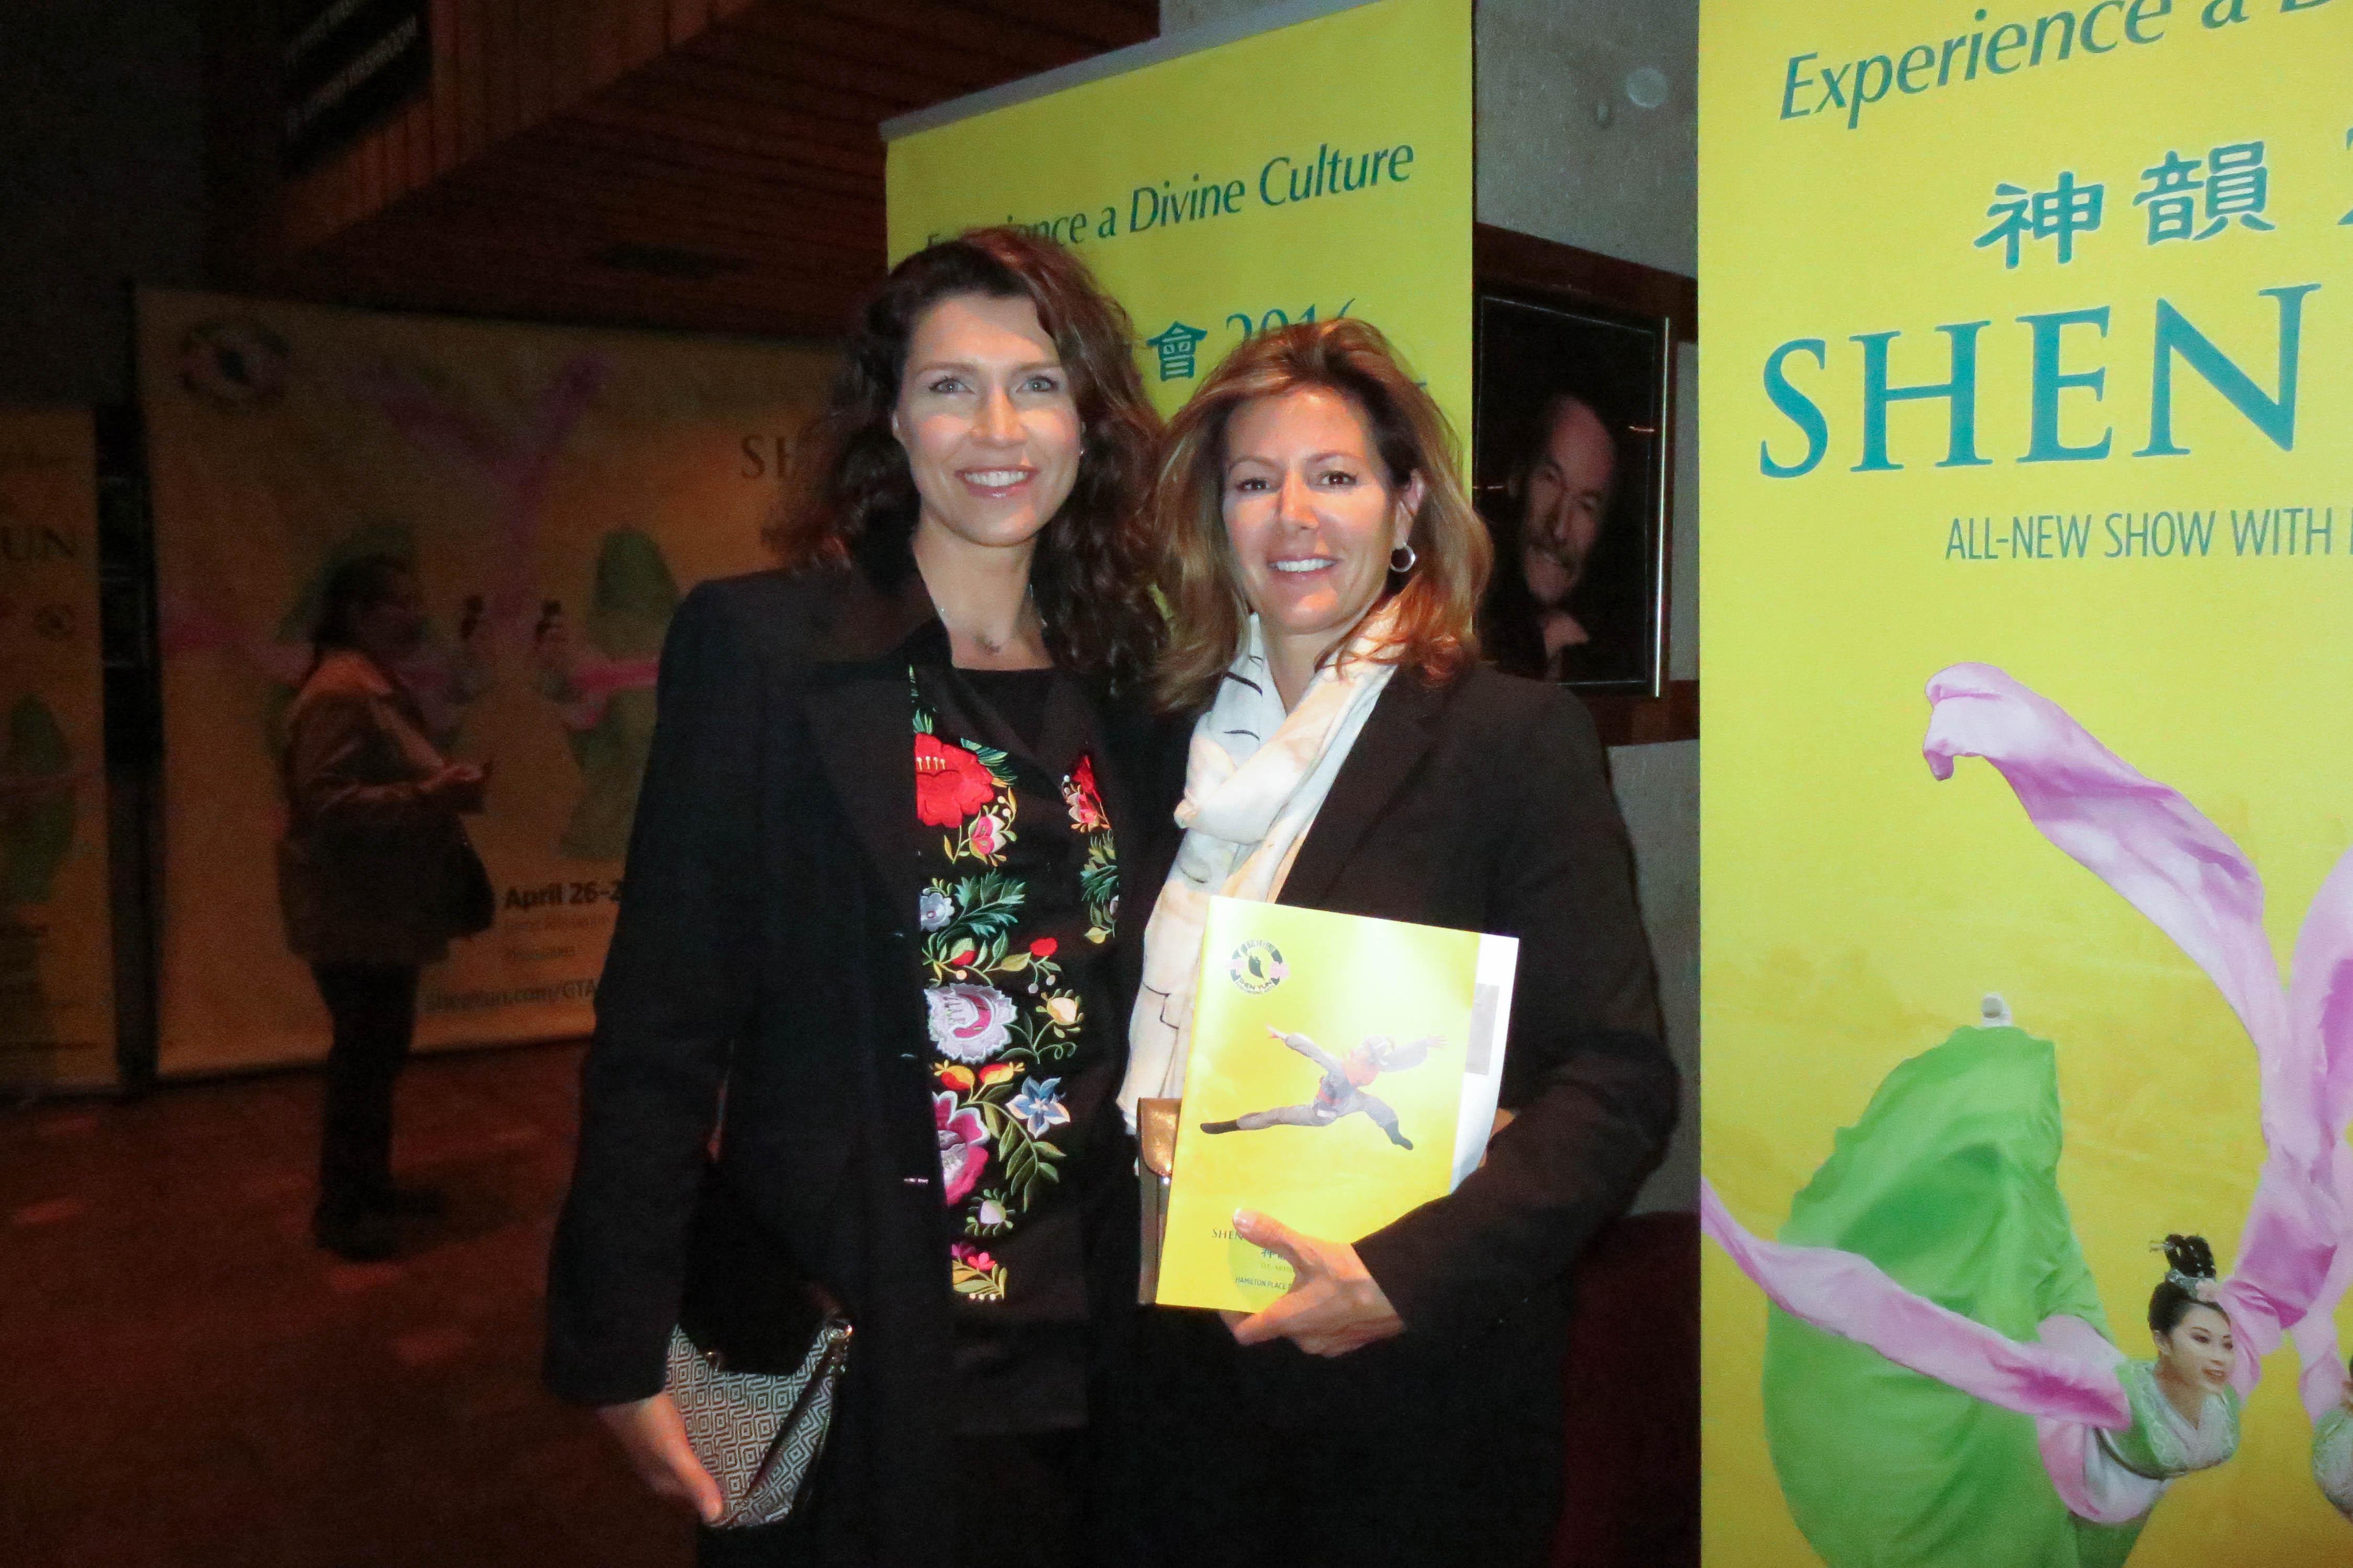 Friends Helga Tomko and Caroline Hemel had an inspiration experience watching Shen Yun at the Hamilton Place Theatre, May 11, 2016. (Madalina Hubert/Epoch Times)